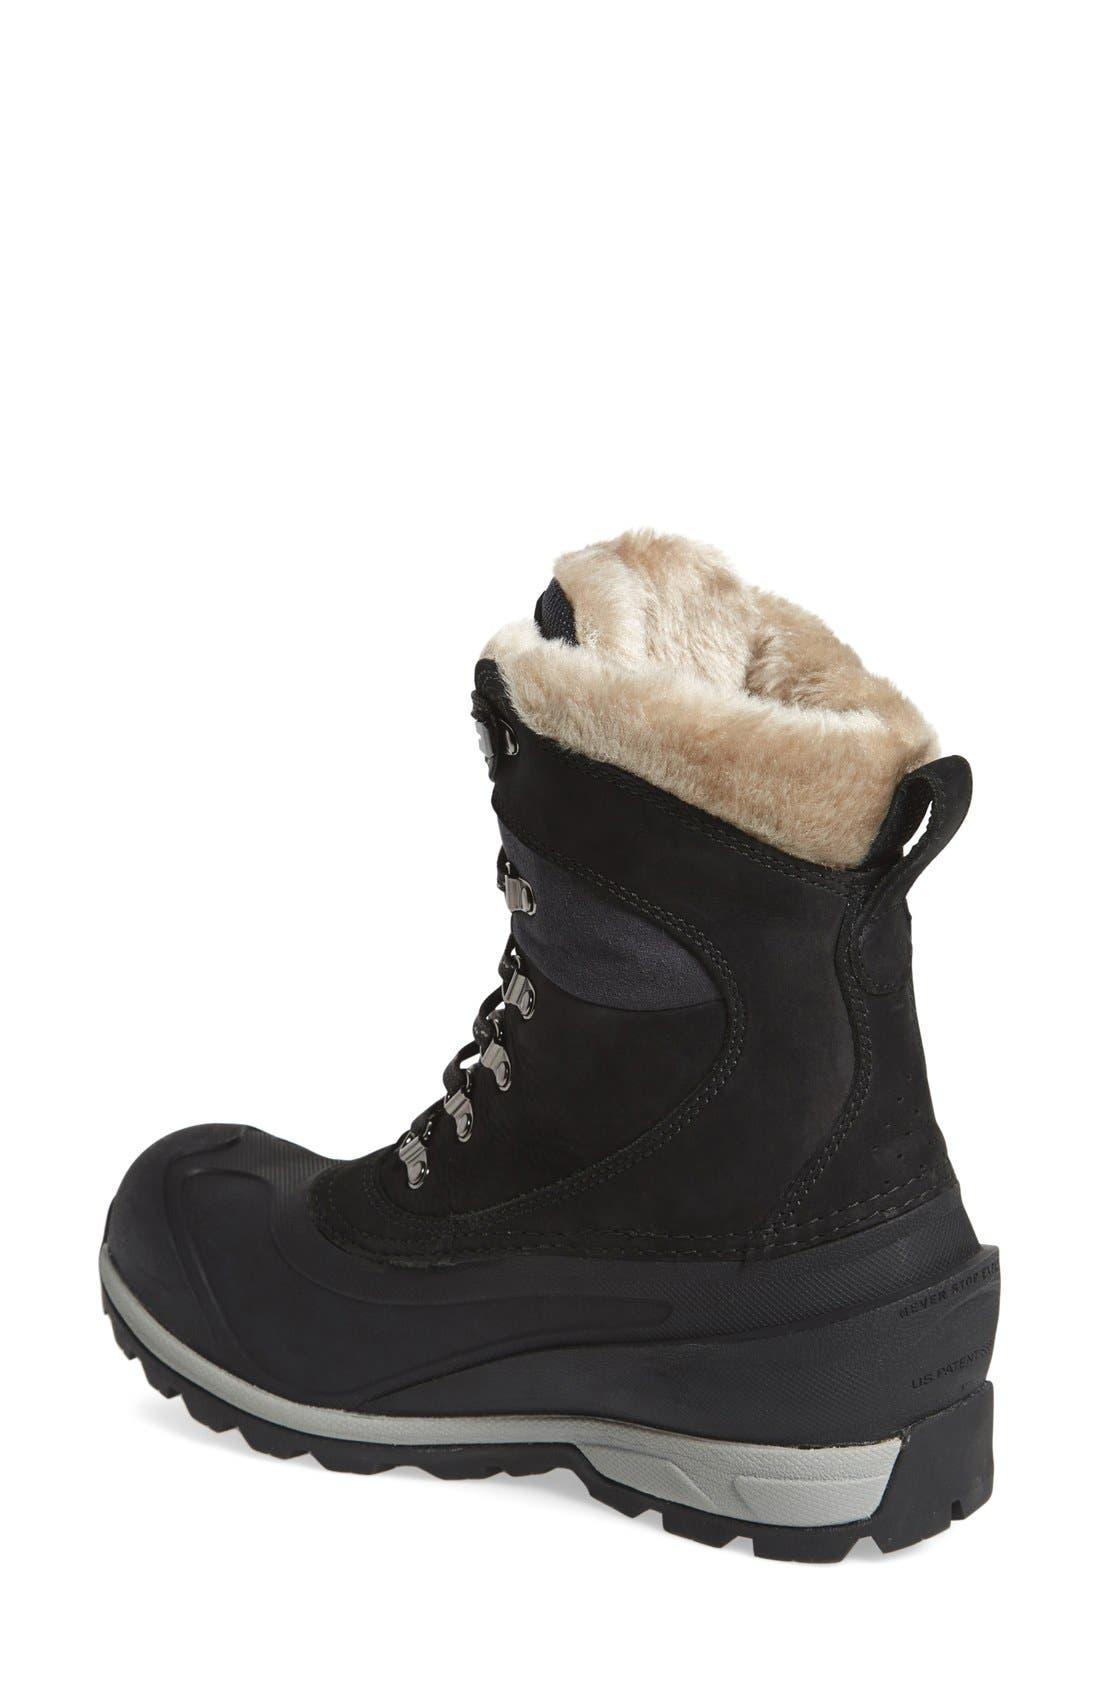 'Chilkat 400' Waterproof PrimaLoft<sup>®</sup> Insulated Boot,                             Alternate thumbnail 4, color,